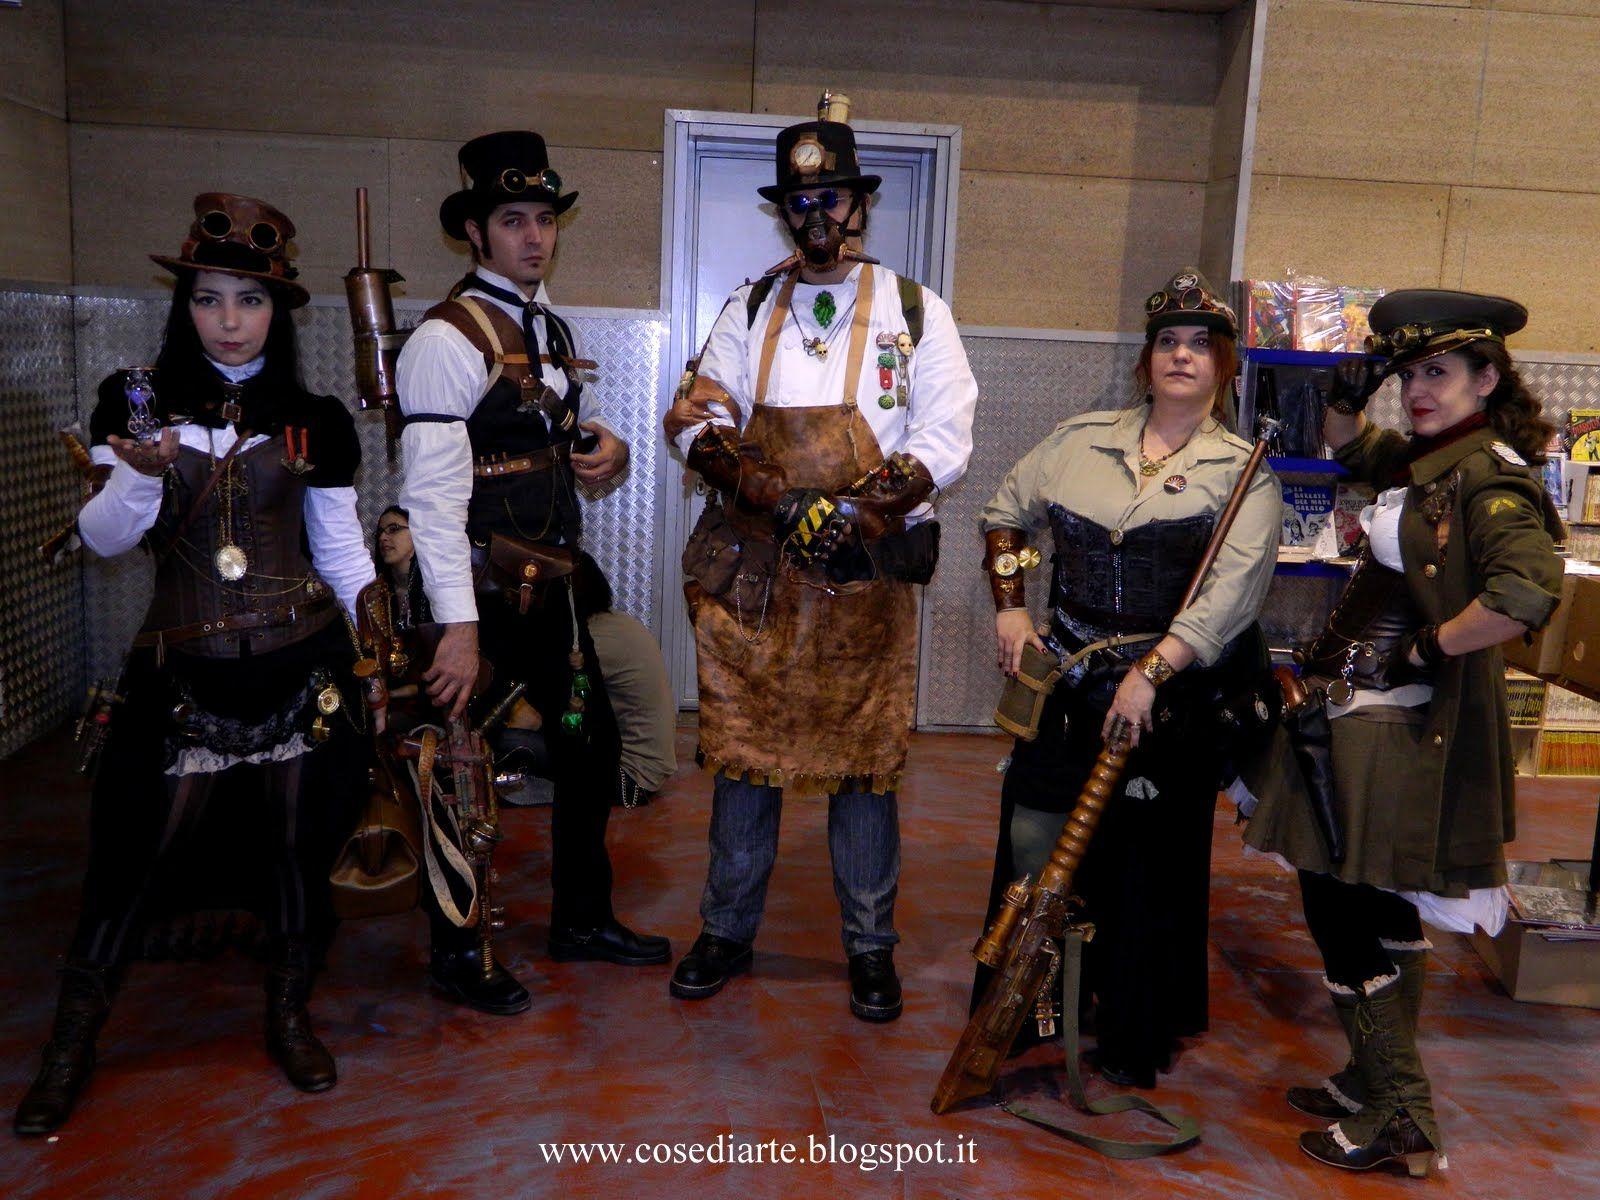 Steampunk group at Fumettopoli